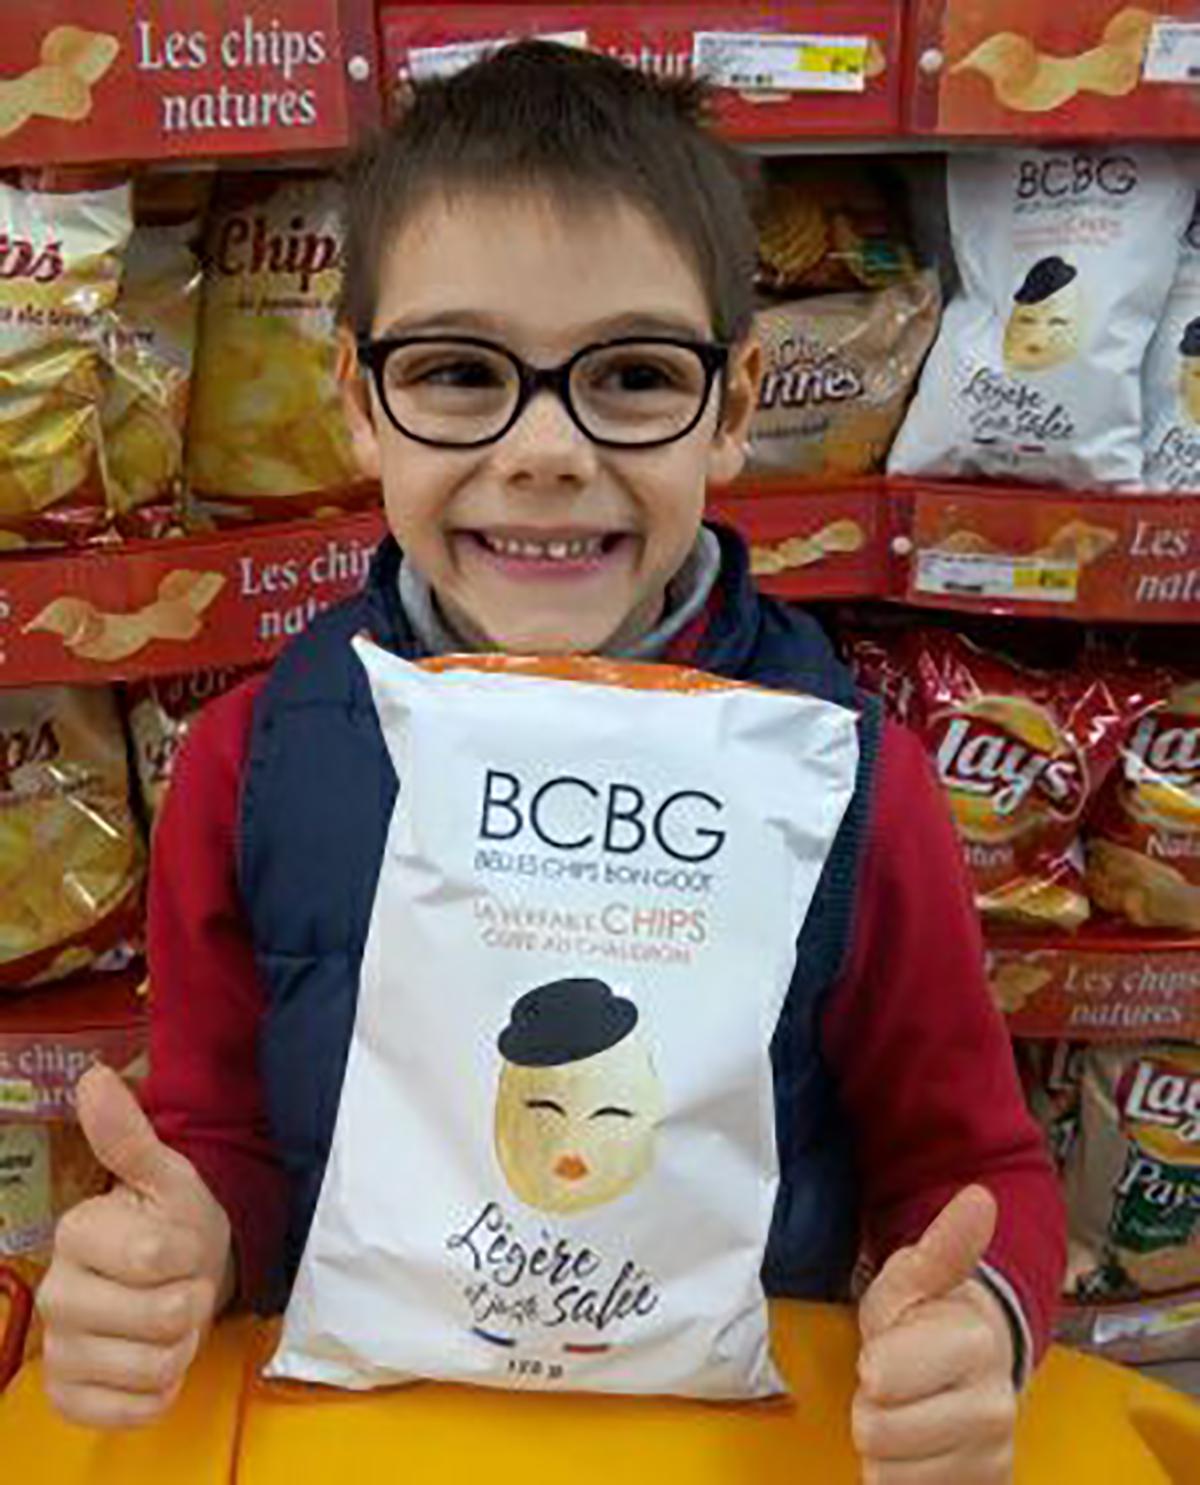 chips-classique-BCBG.jpg